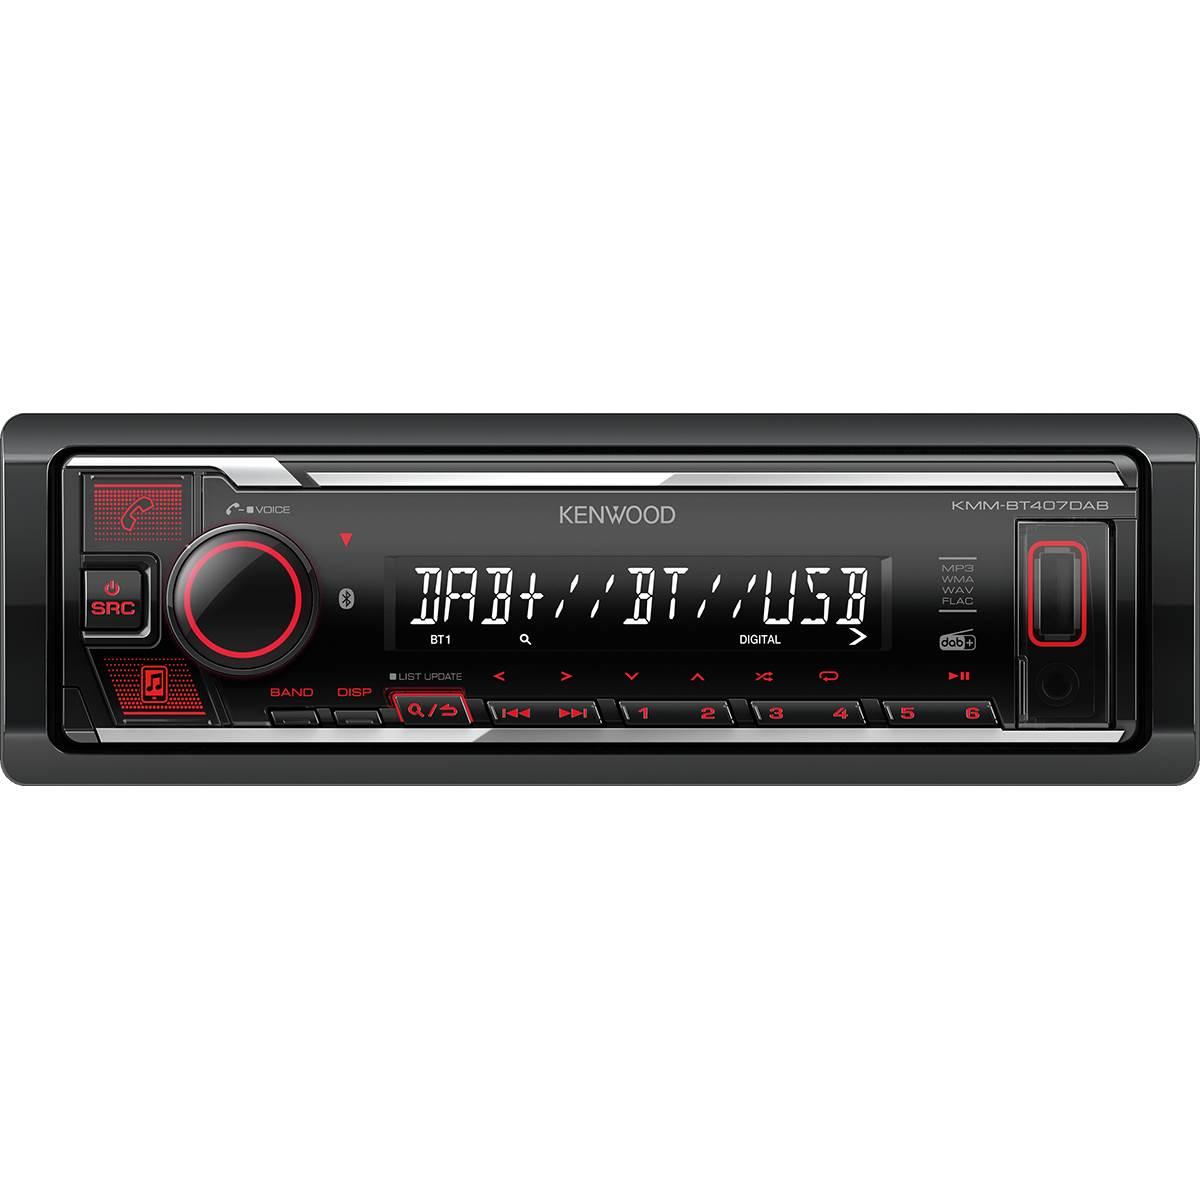 Autoradio KMM-BT407DAB + Antenne DAB+ Kenwood